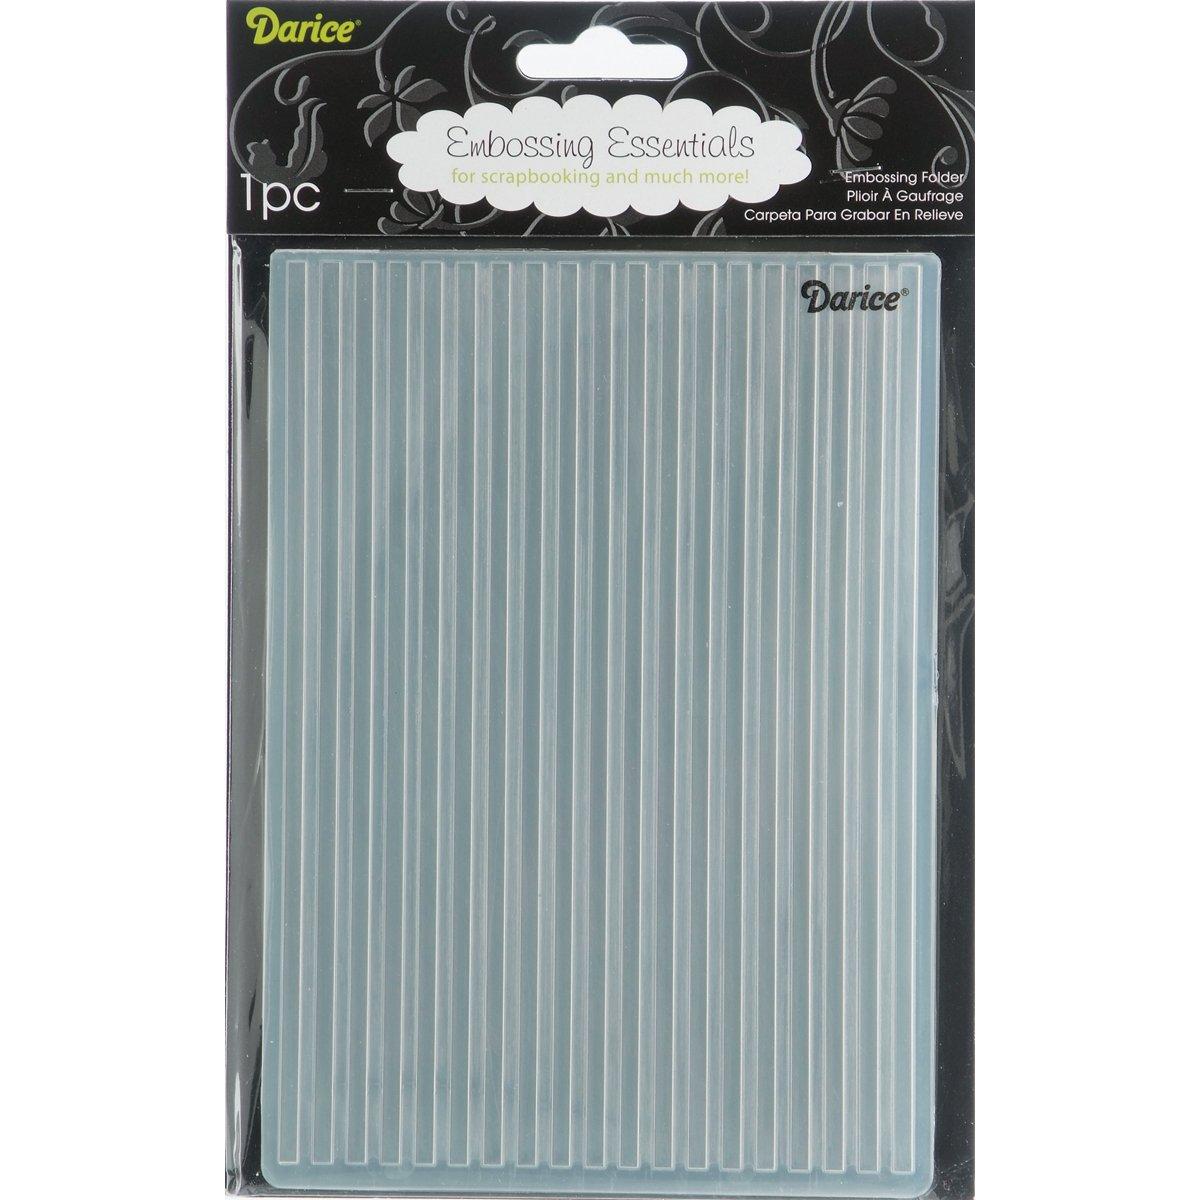 12.7 x 17.8 x 0.11 cm Plastic Darice Embossing Folder Pr/ägefolder-Schablone Streifen-Stripe-12,7 x 17,8 cm transparent